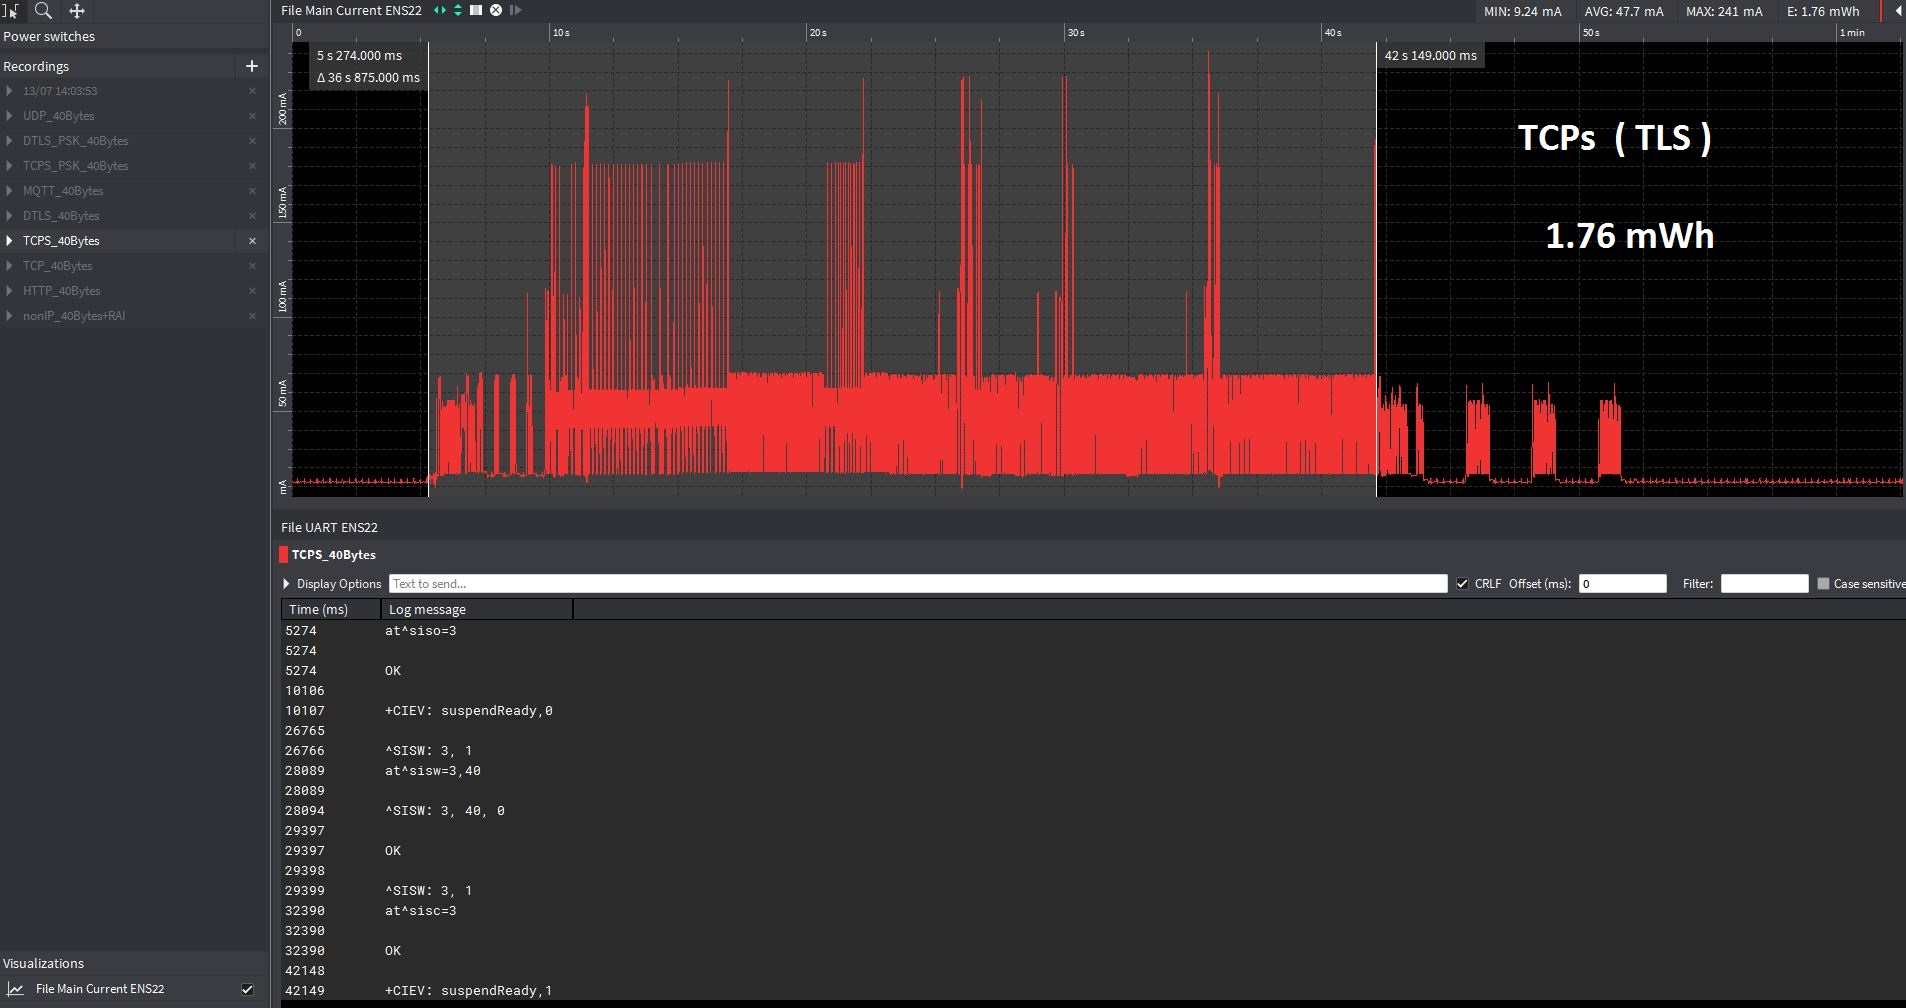 Data via secure TCP socket (TLS) power consumption